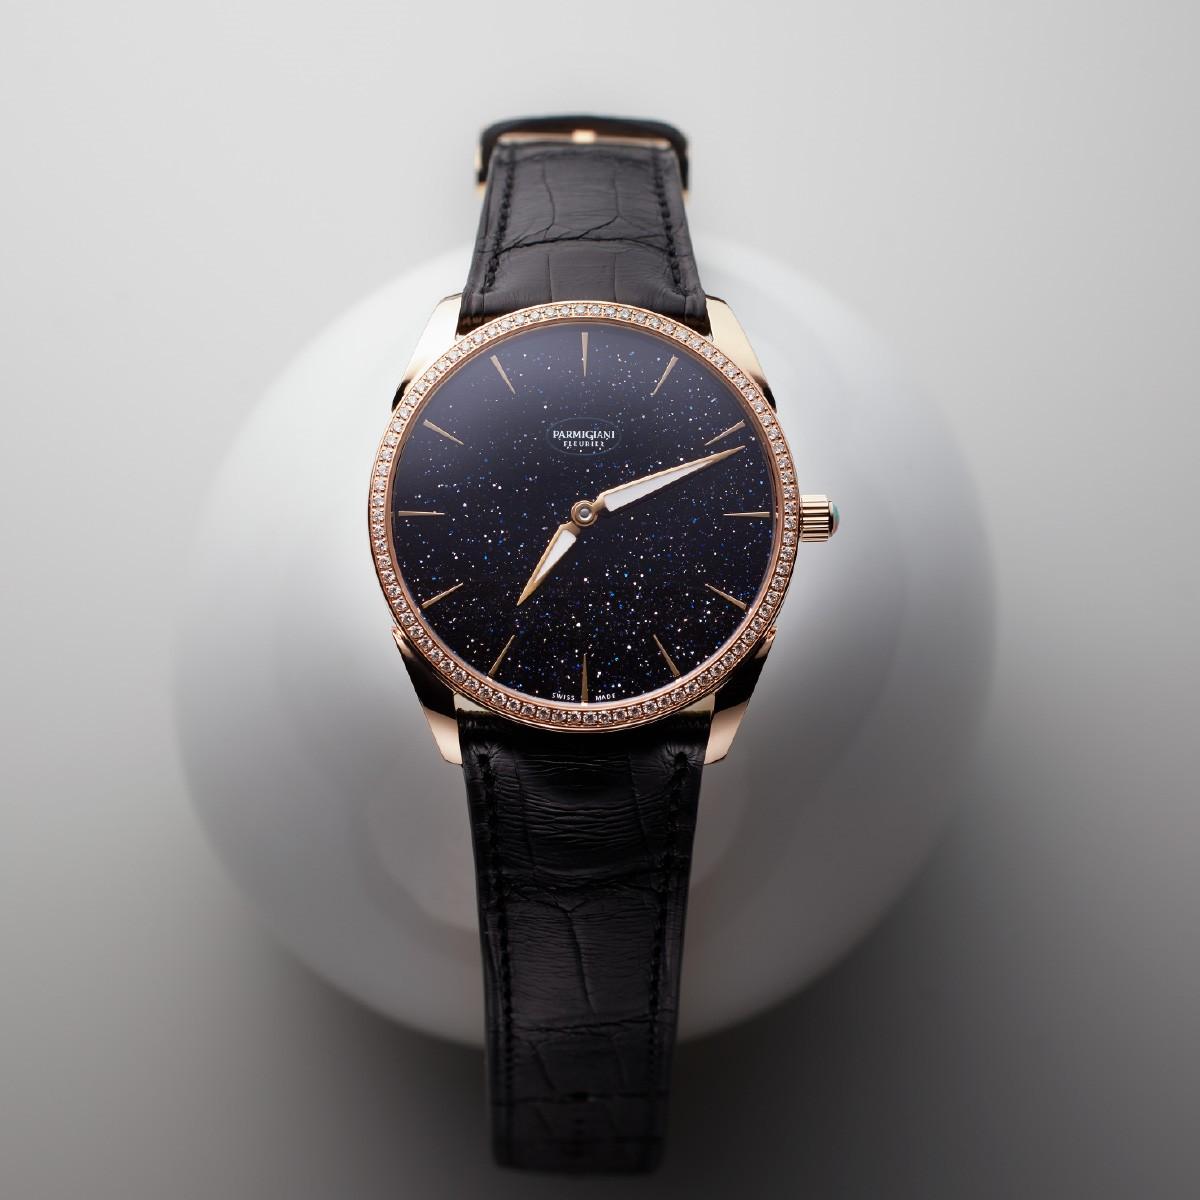 Produkt ParmigianiTonda GalaxyrefPFC HA Preis